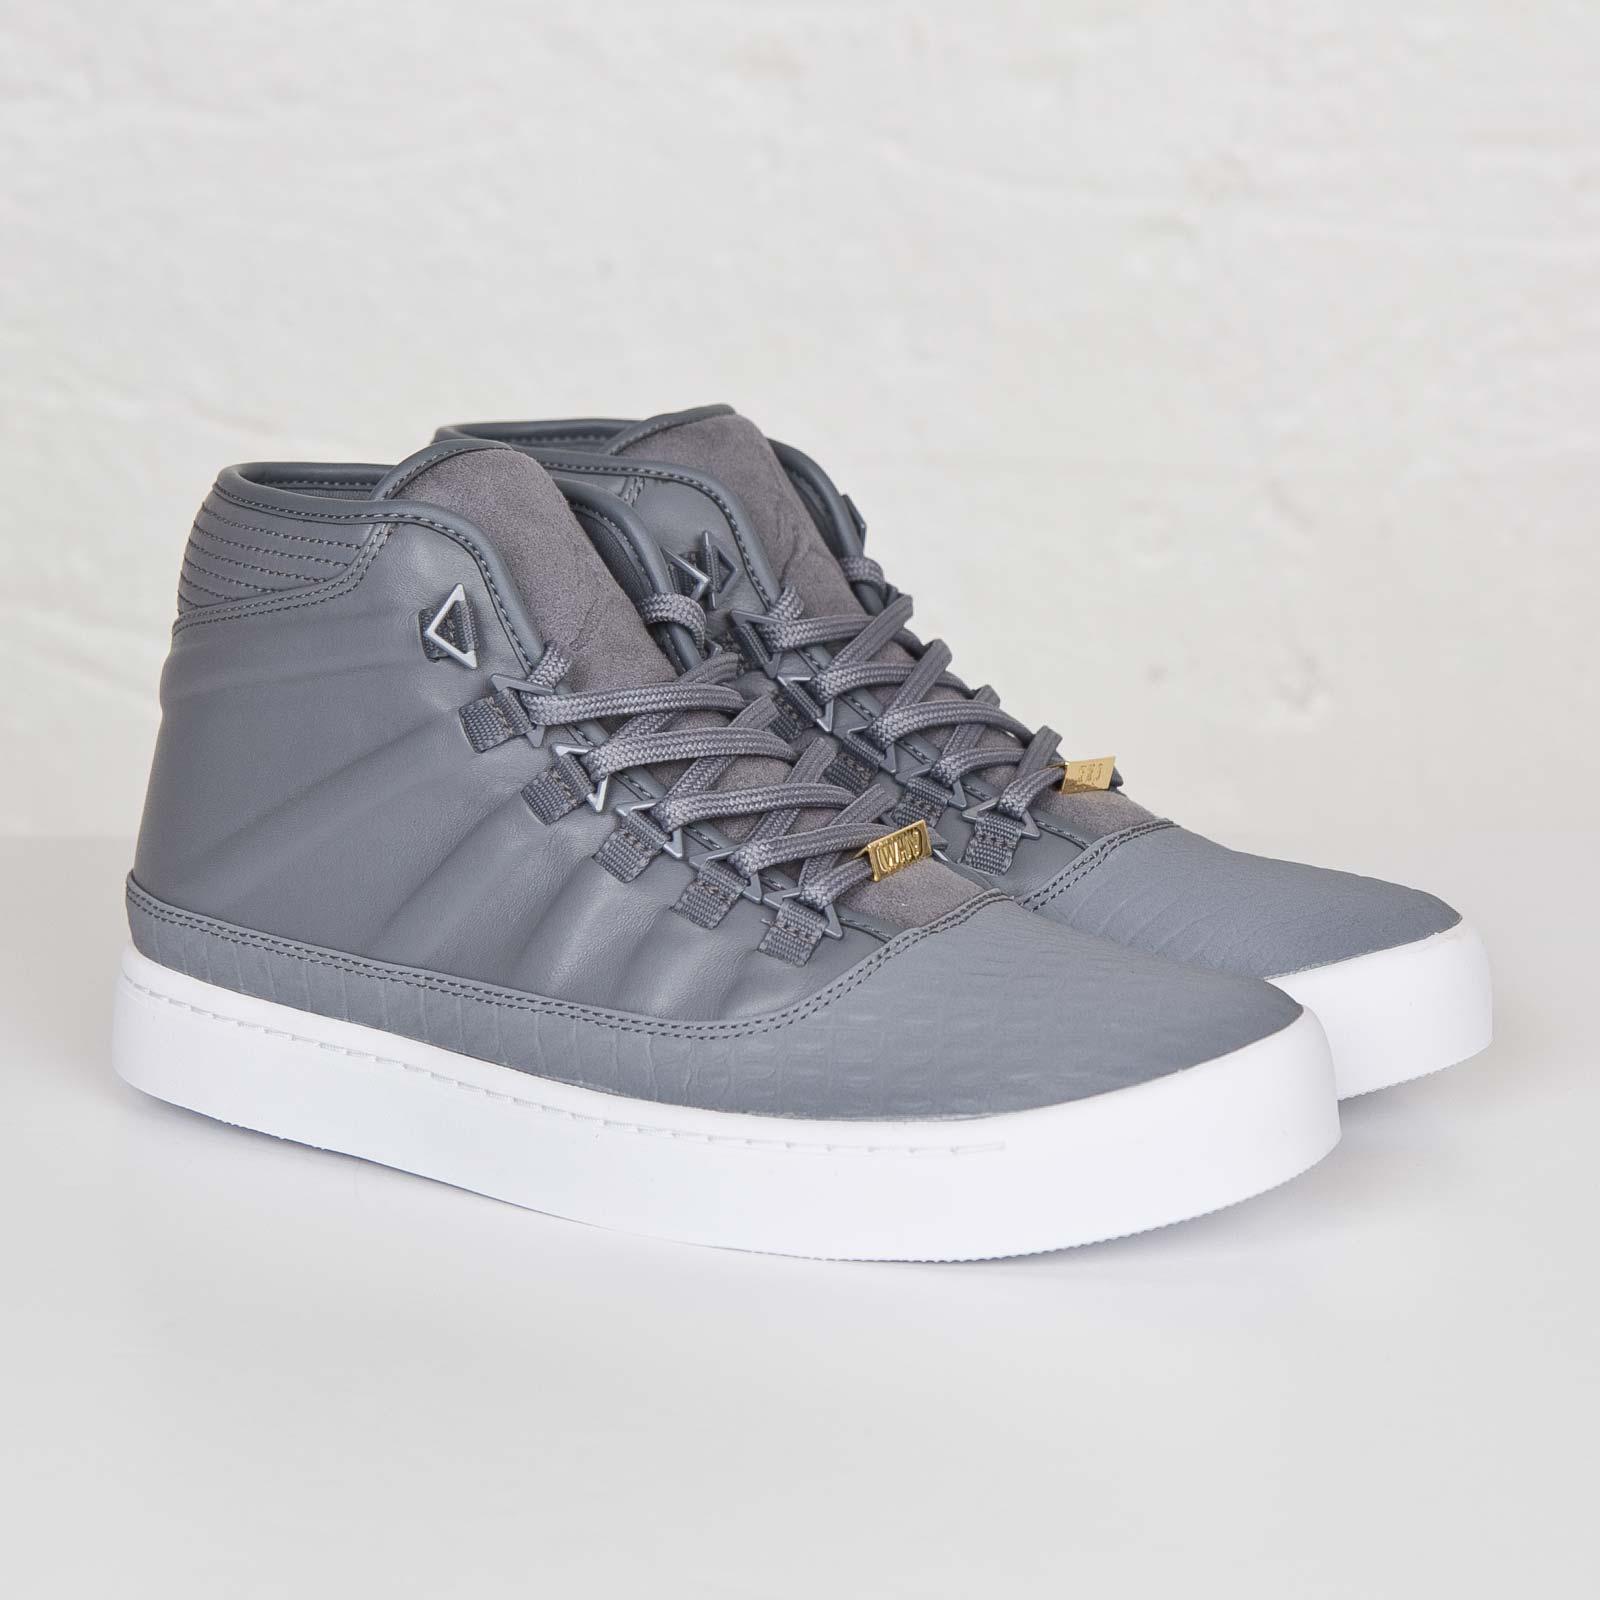 check out b1bf0 3c662 Jordan Brand Jordan Westbrook 0